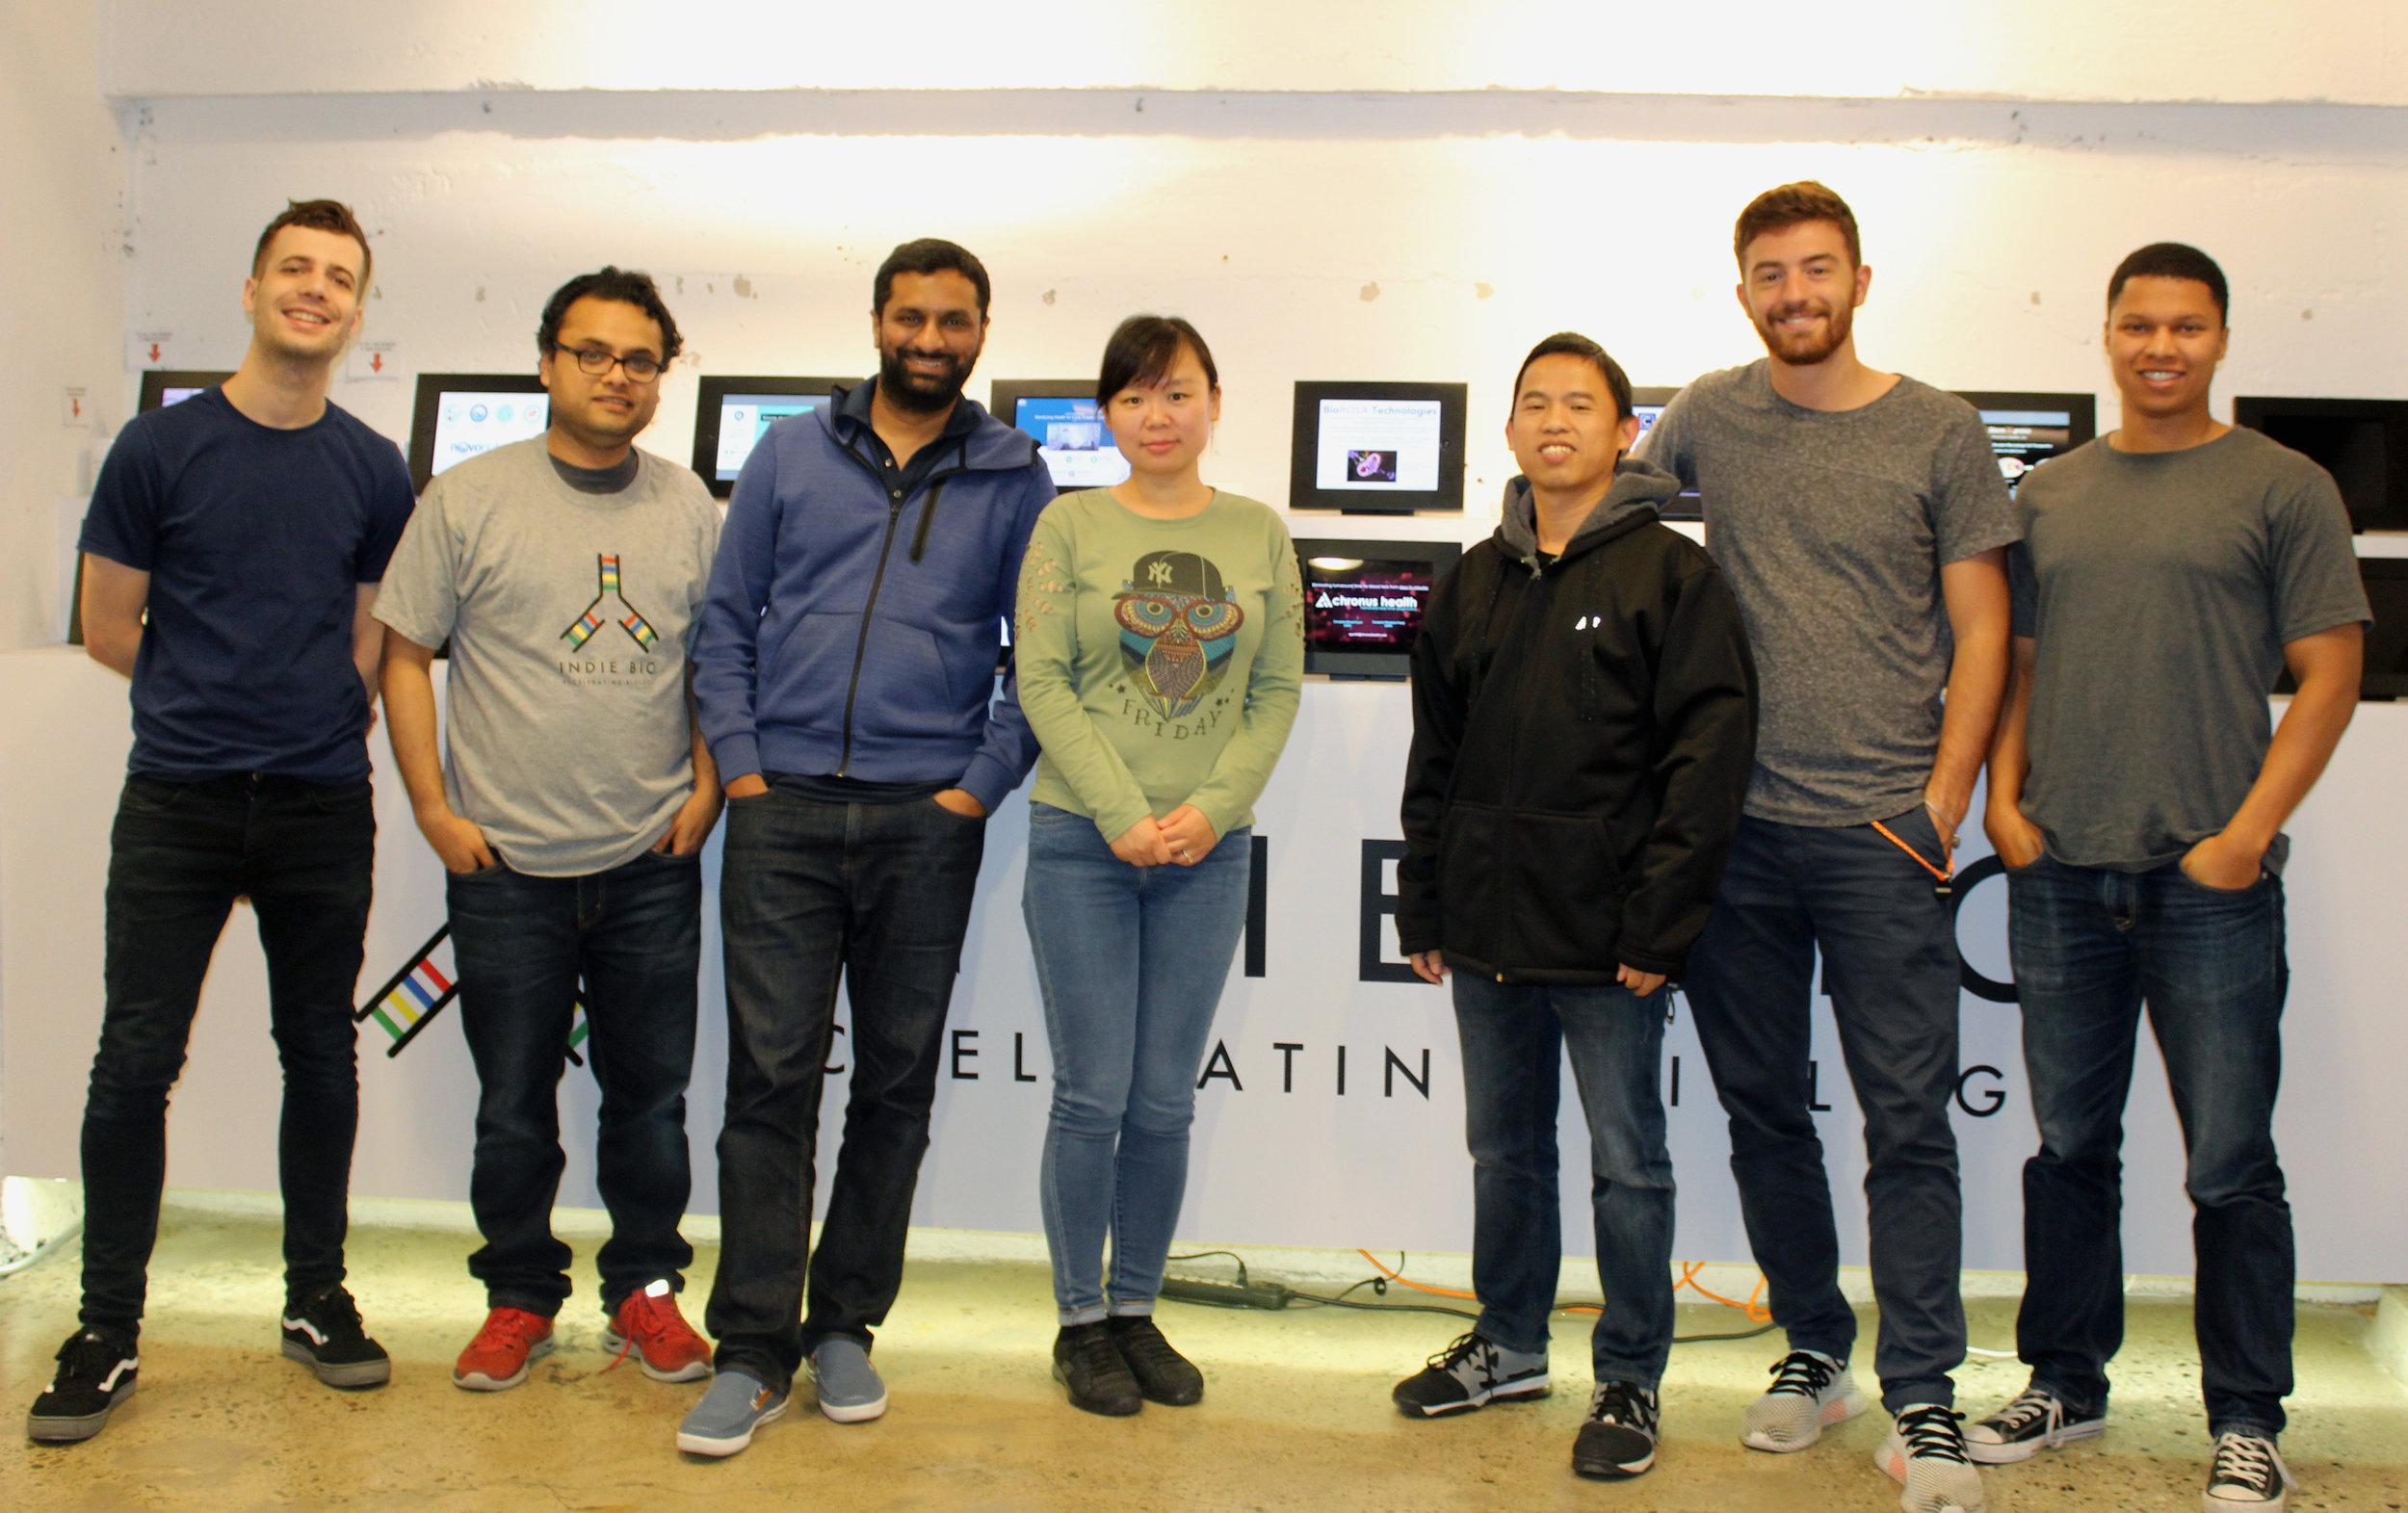 (Left to Right) Mitchell Bond, Ashish Jagtiani, Anand Parikh, Yue Zhao, Ming Yi, Enrico Grassilli, Christopher Everett